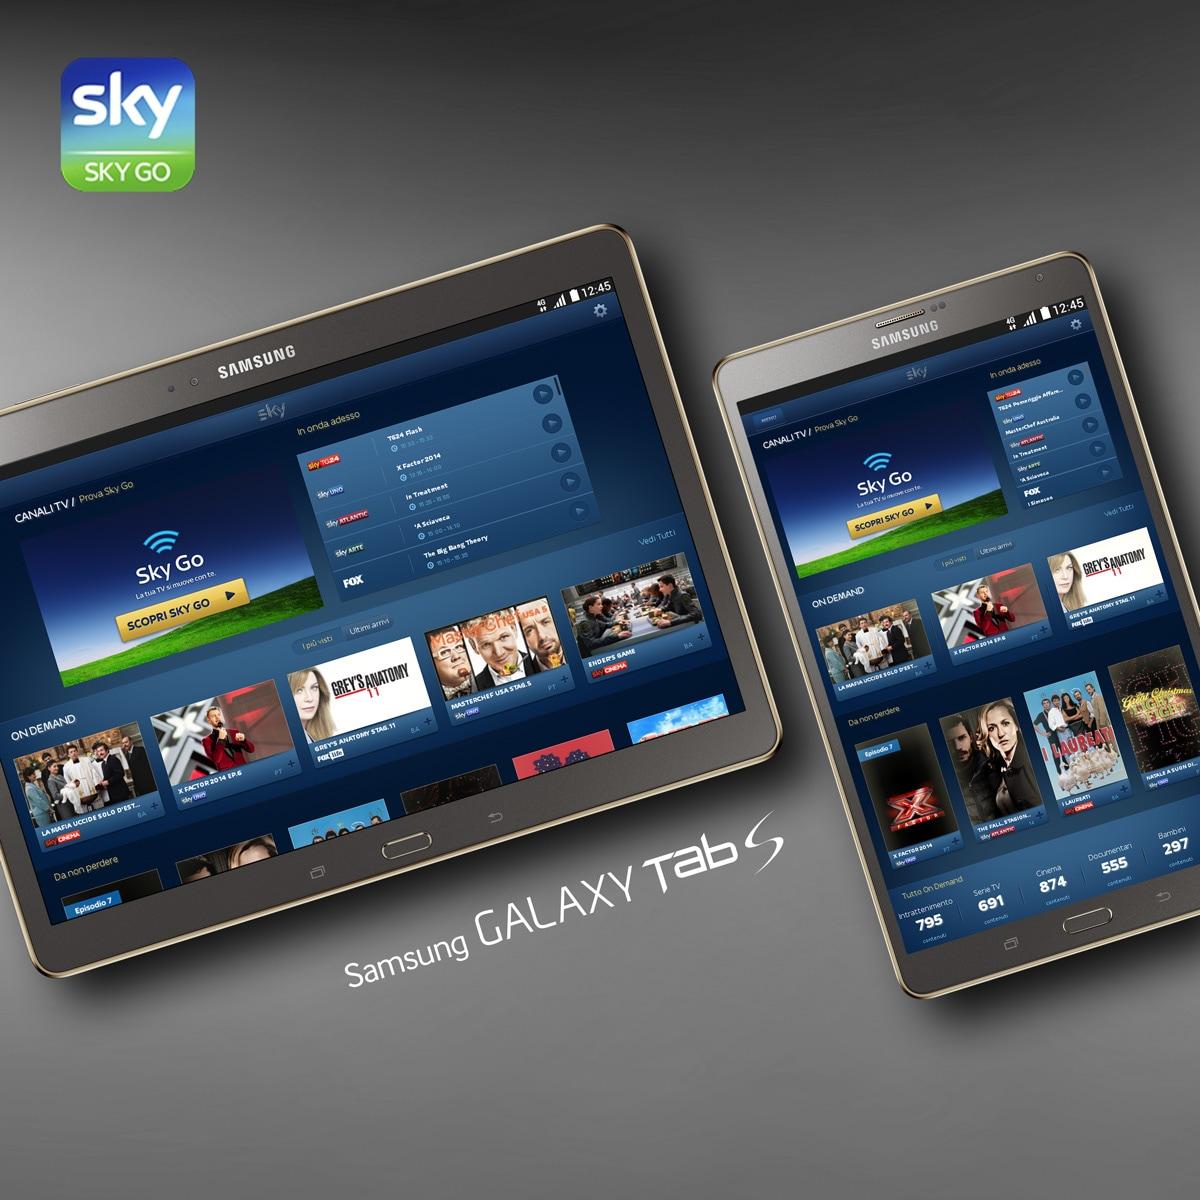 Samsung_Galaxy_Tab_S_con_Sky_Go